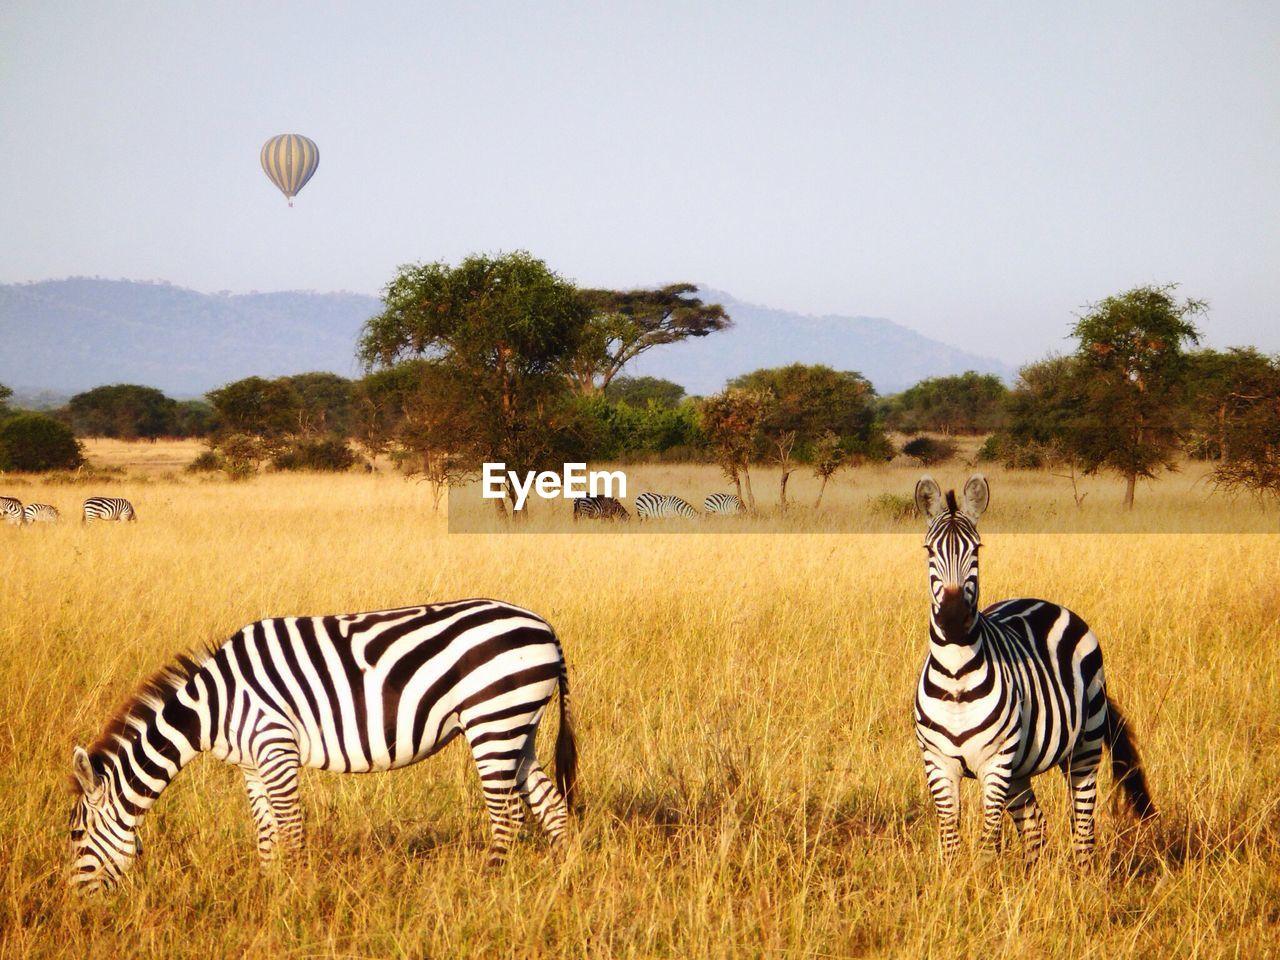 Zebras On Grassy Field Against Sky At Serengeti National Park